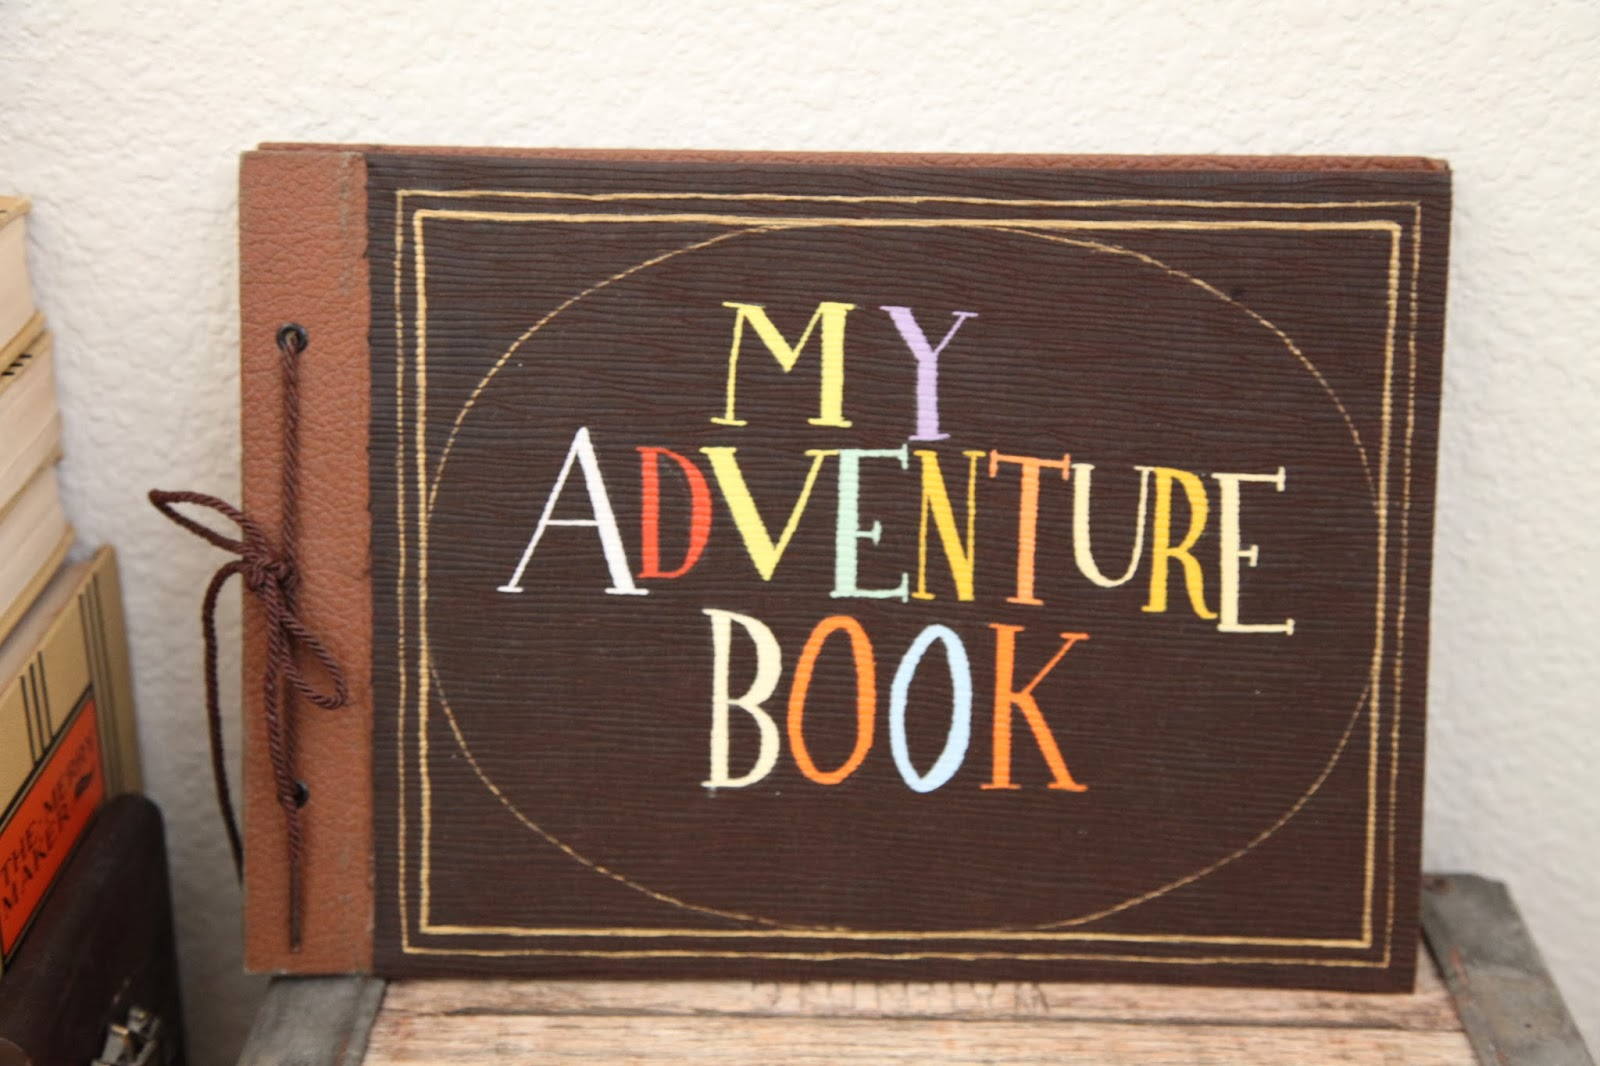 Roscoe's Story: My Adventure Book